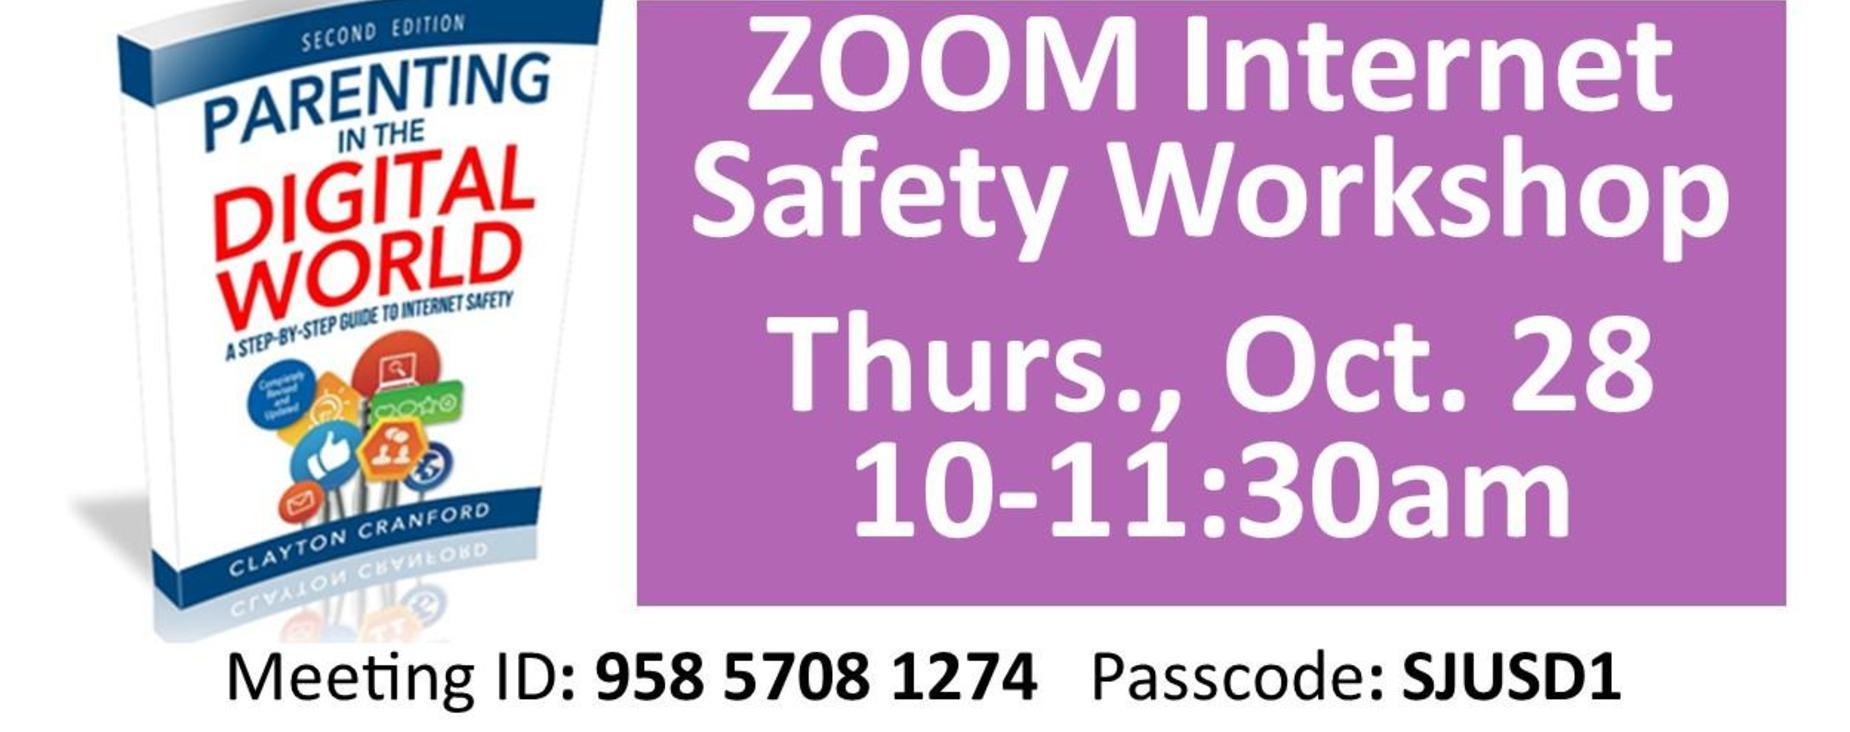 Zoom Internet Safety Workshop Thurs Oct 28 10-11:30am